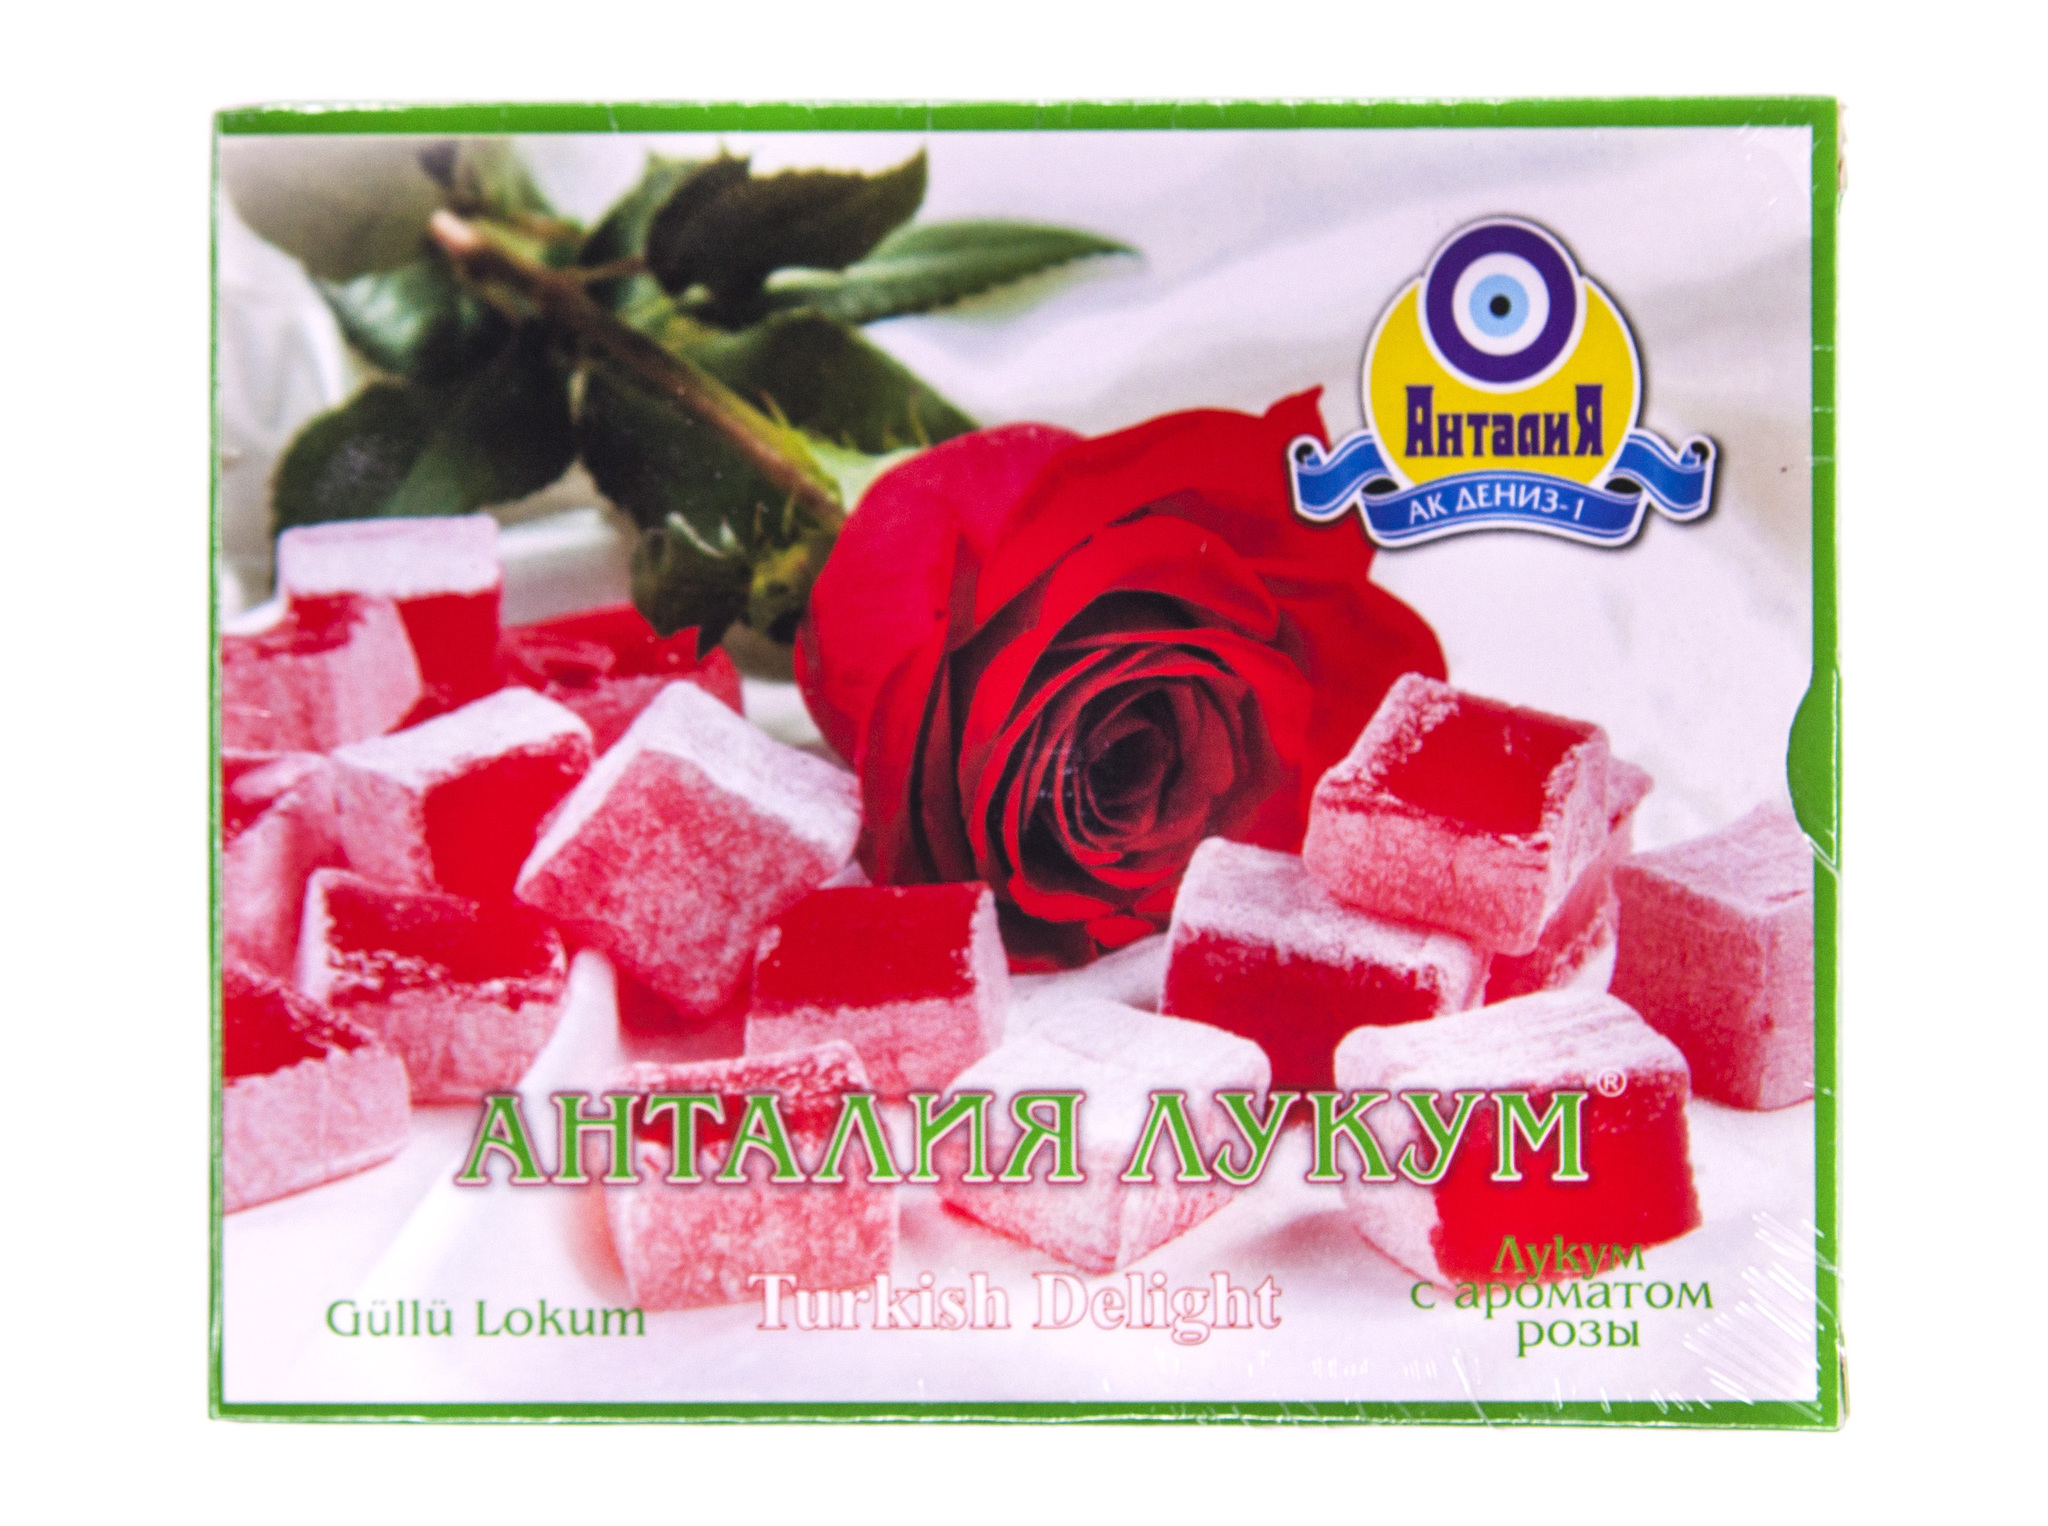 Рахат лукум с ароматом розы, Акдениз, 125 г import_files_0a_0a92f0b434ae11e89e58448a5b3752ae_a6cc0a75486511e8a996484d7ecee297.jpg